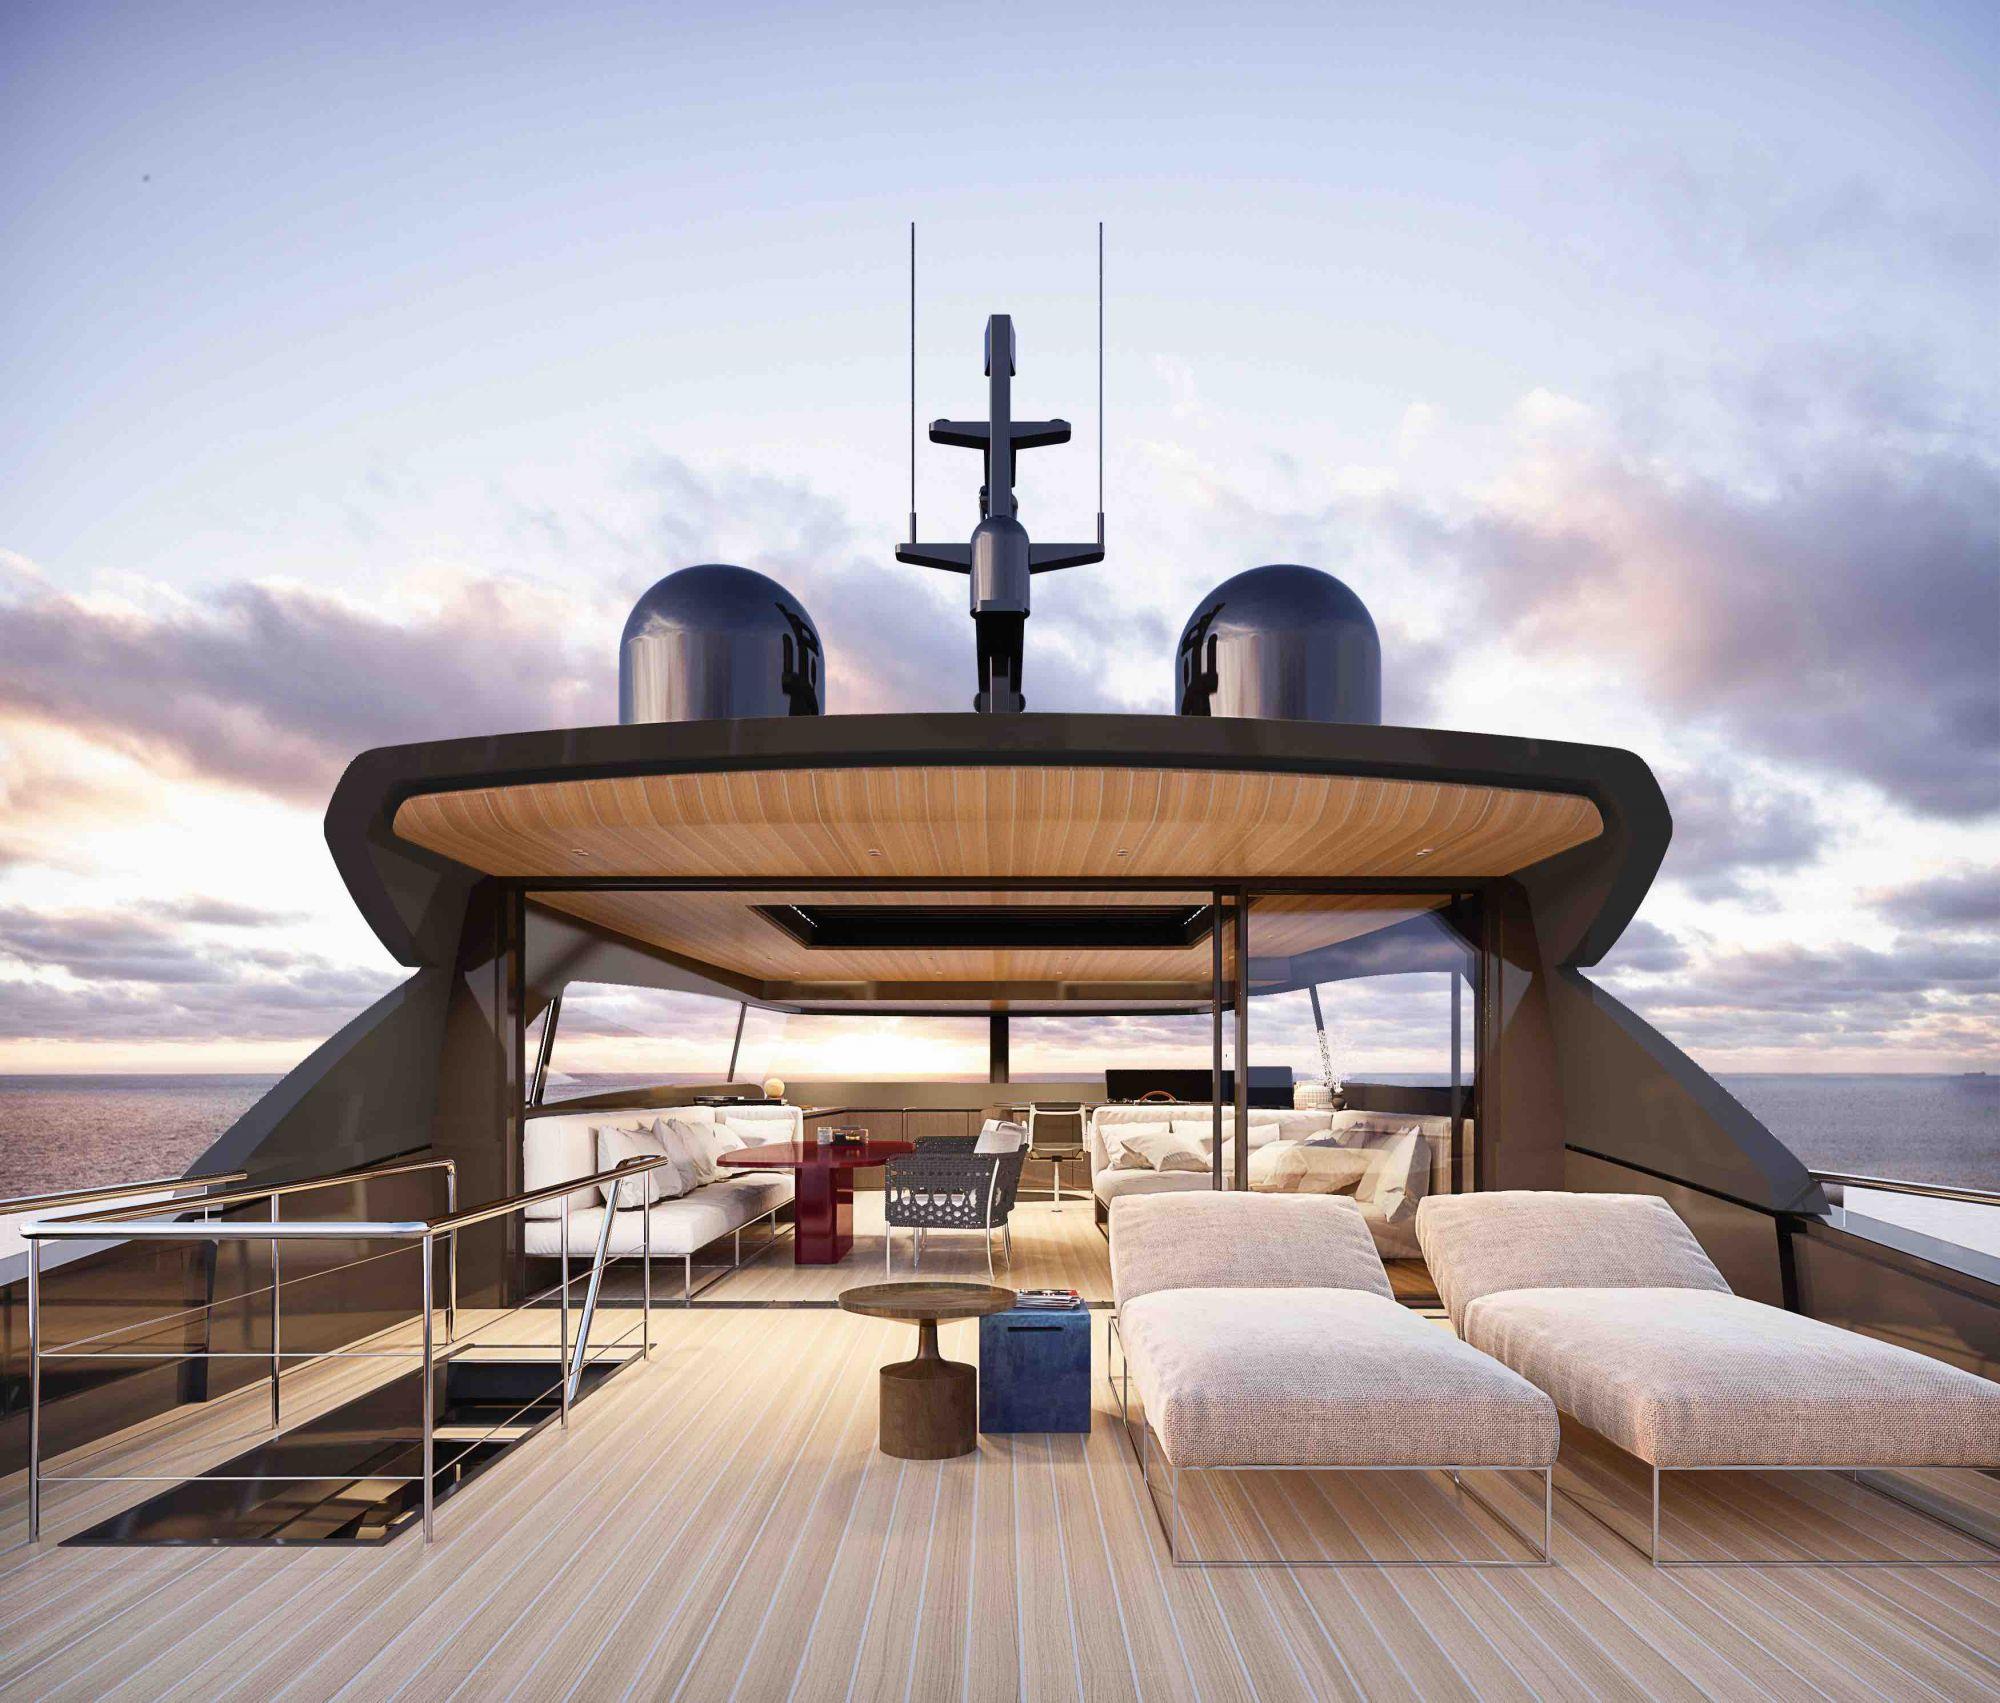 Piero Lissoni Designs Italian Yachting Brand Sanlorenzo's Singapore Showroom